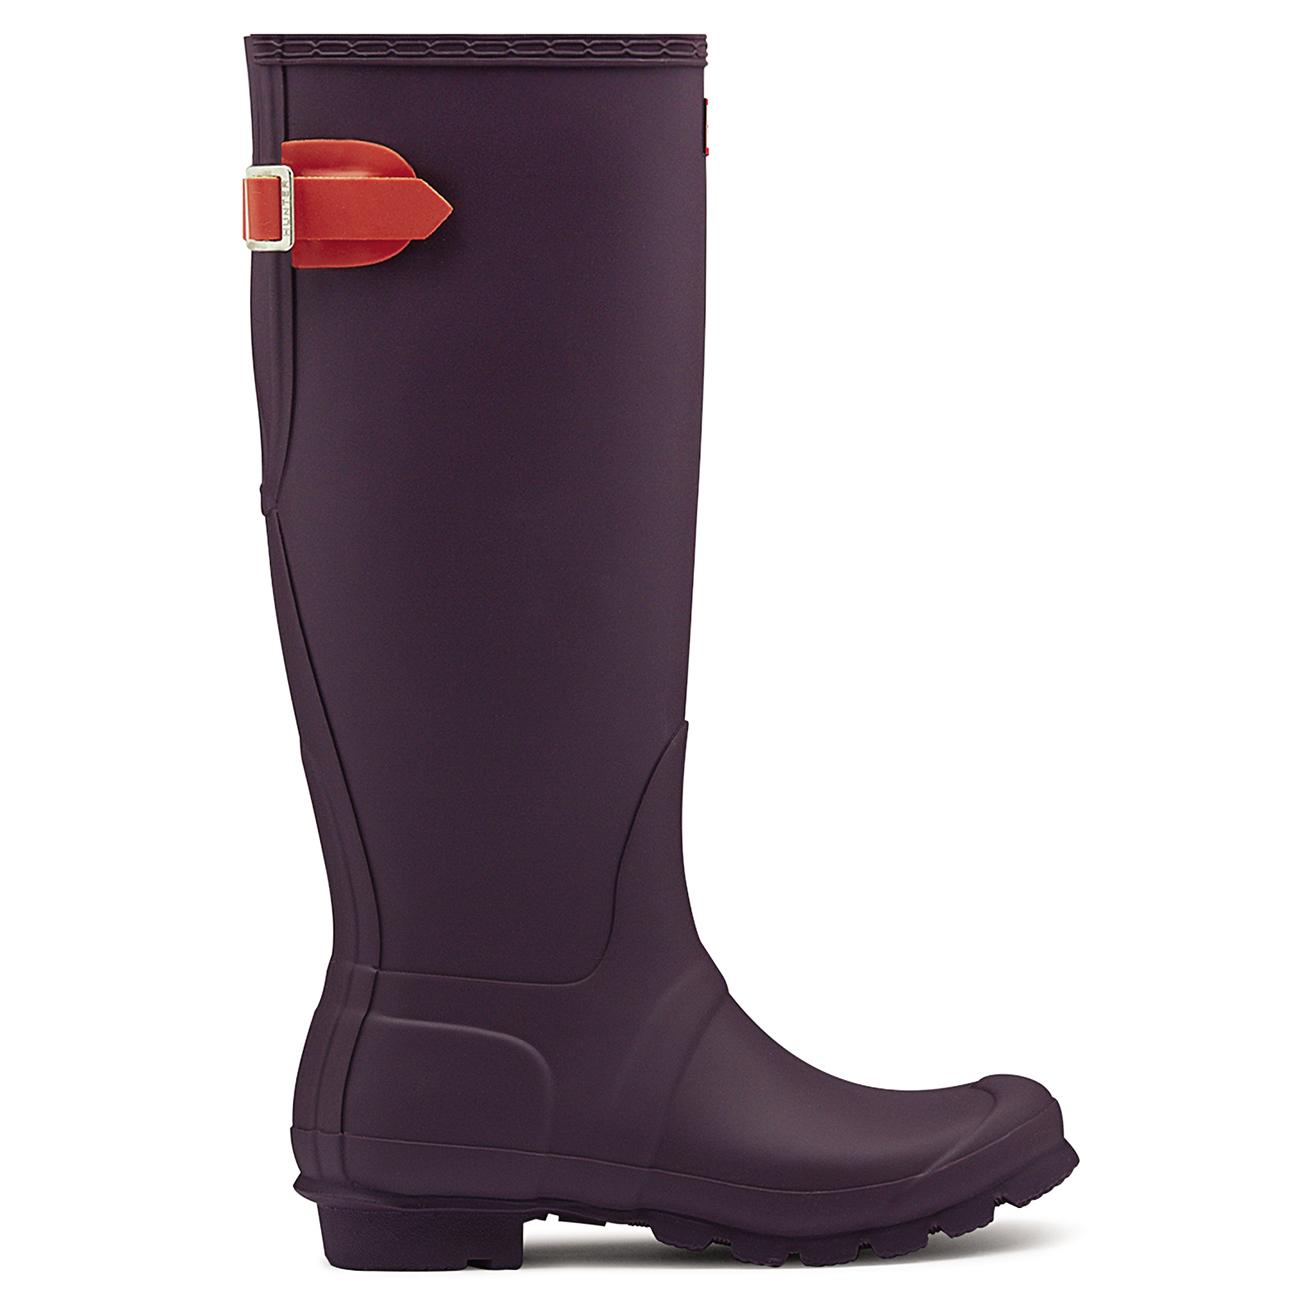 Damen Regen Hunter Adjustable Back Schnee Regen Damen Gummi Wasserdicht Stiefel EU 36-43 de1407